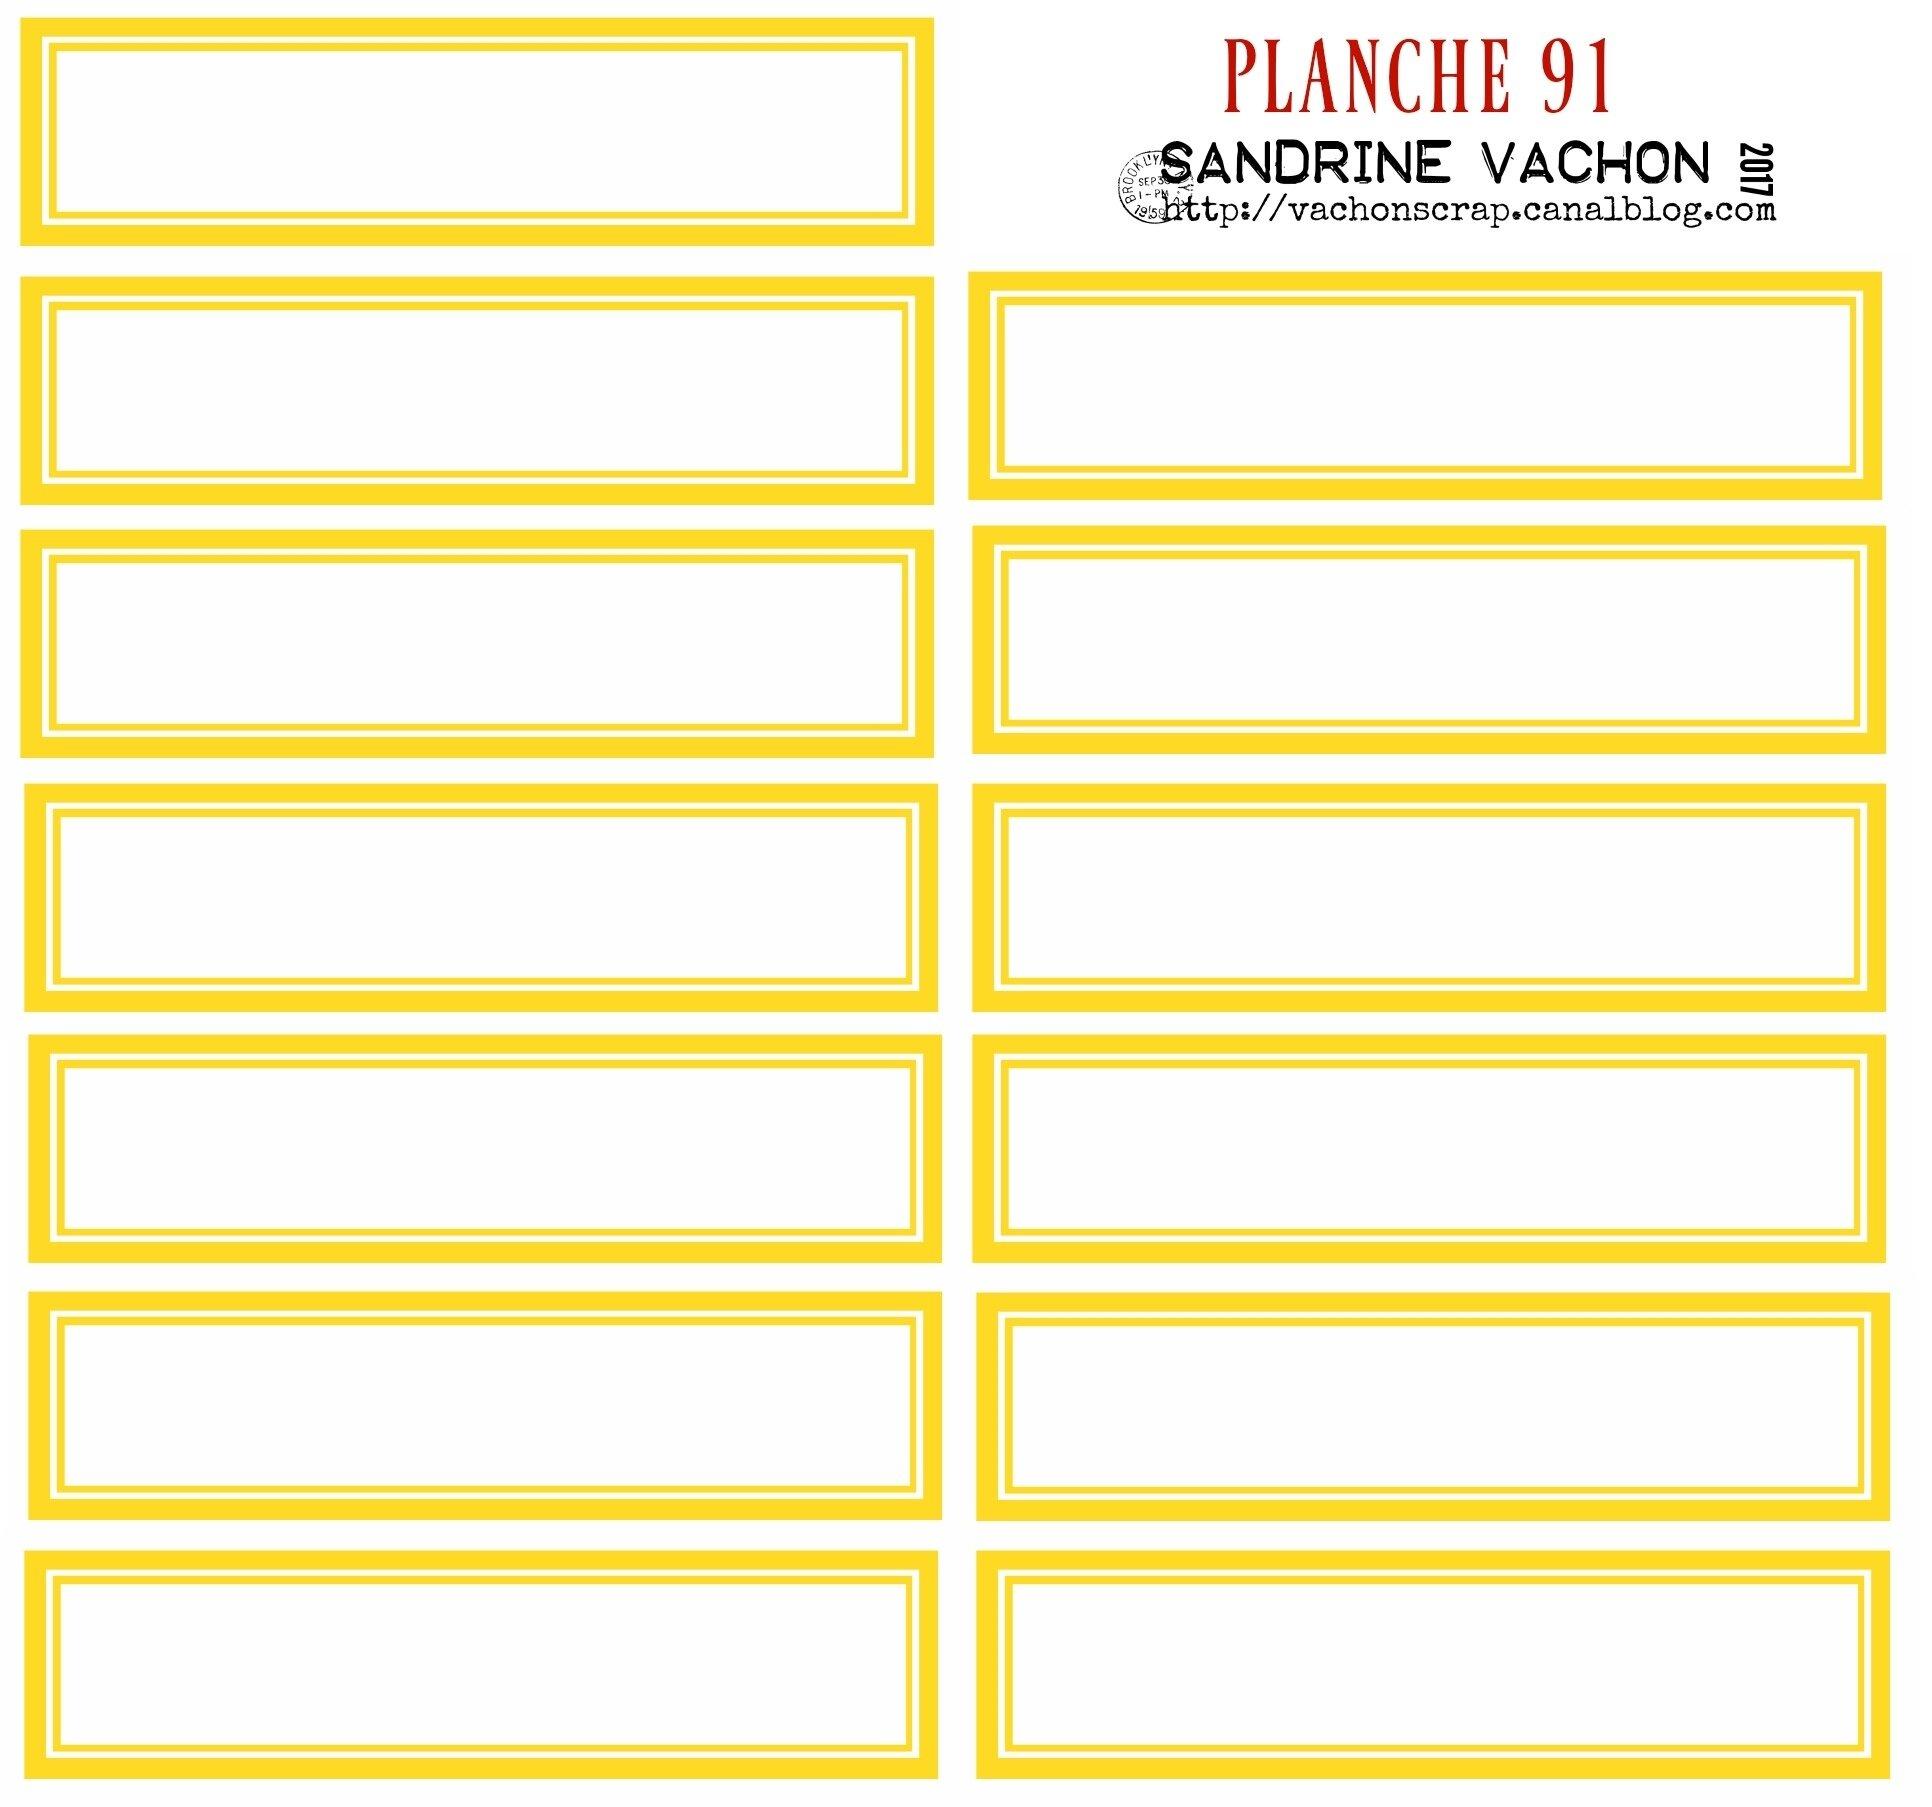 PLANCHE 91 JAUNE